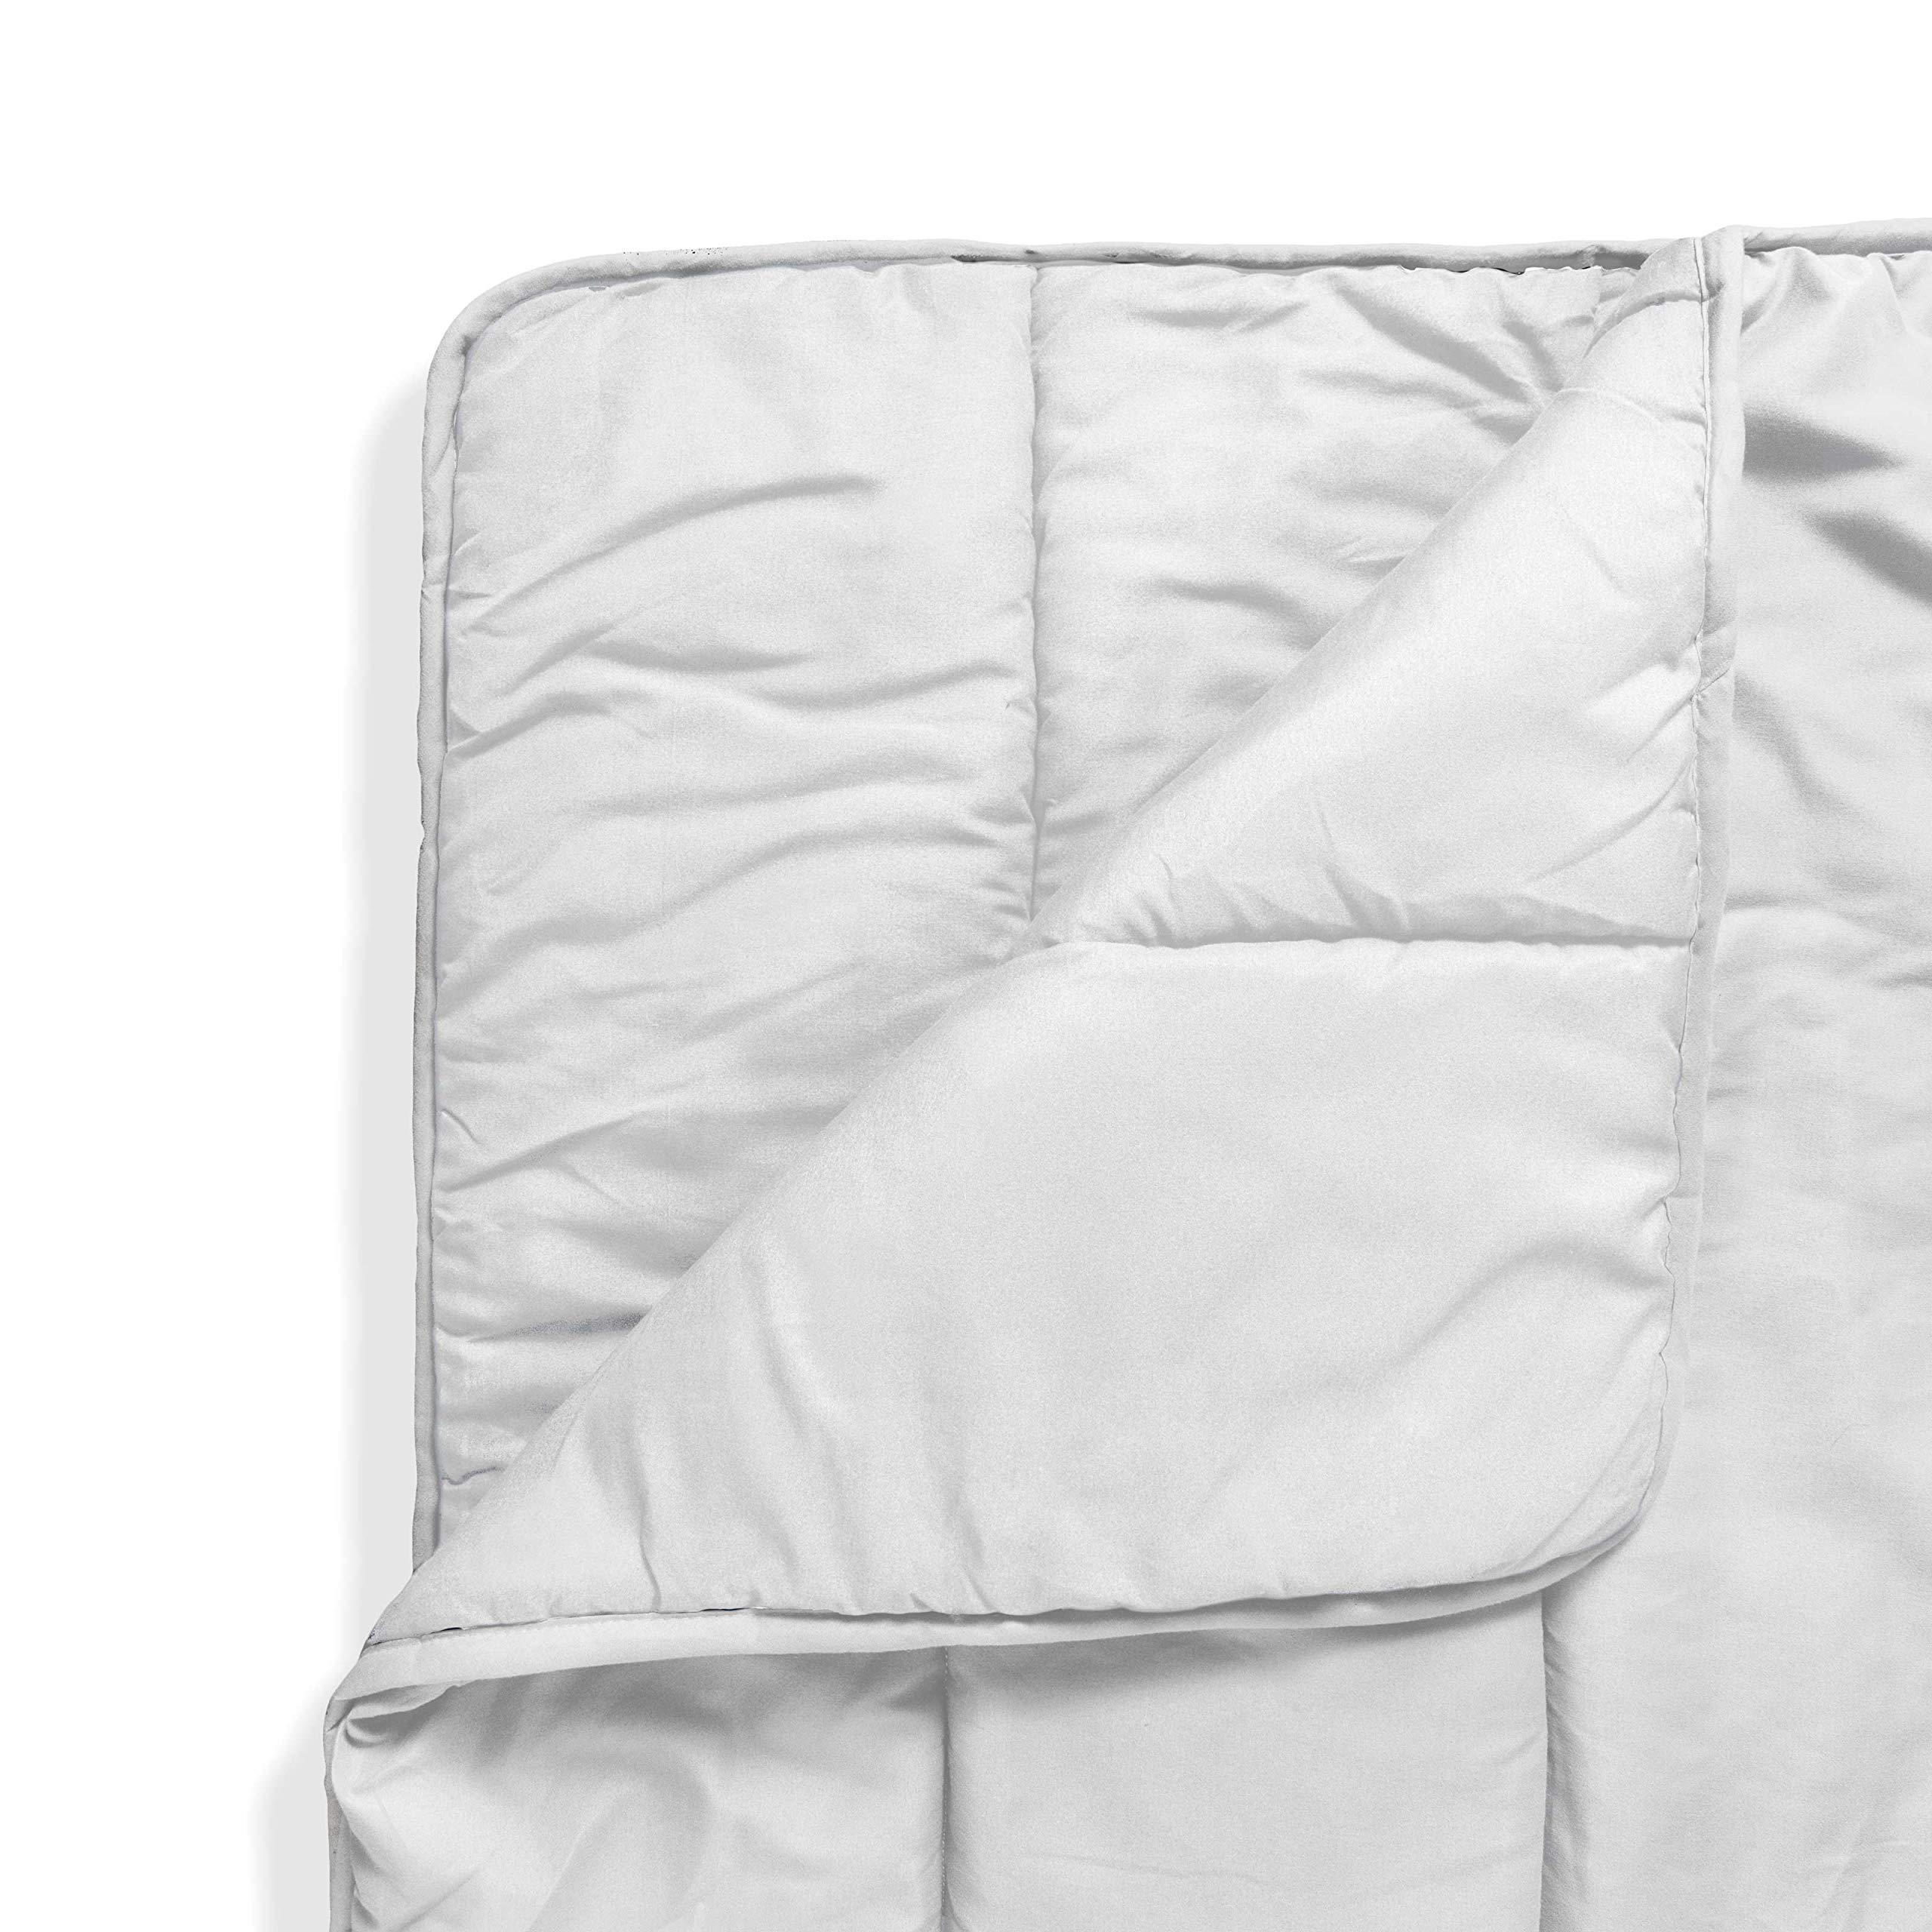 ViscoSoft - Reversible Down Alternative Comforter - Ultra Soft & Comfortable - Premium Microfiber Fill Never Clumps or Shifts - Hypoallergenic, Machine Washable - (White) (Twin)